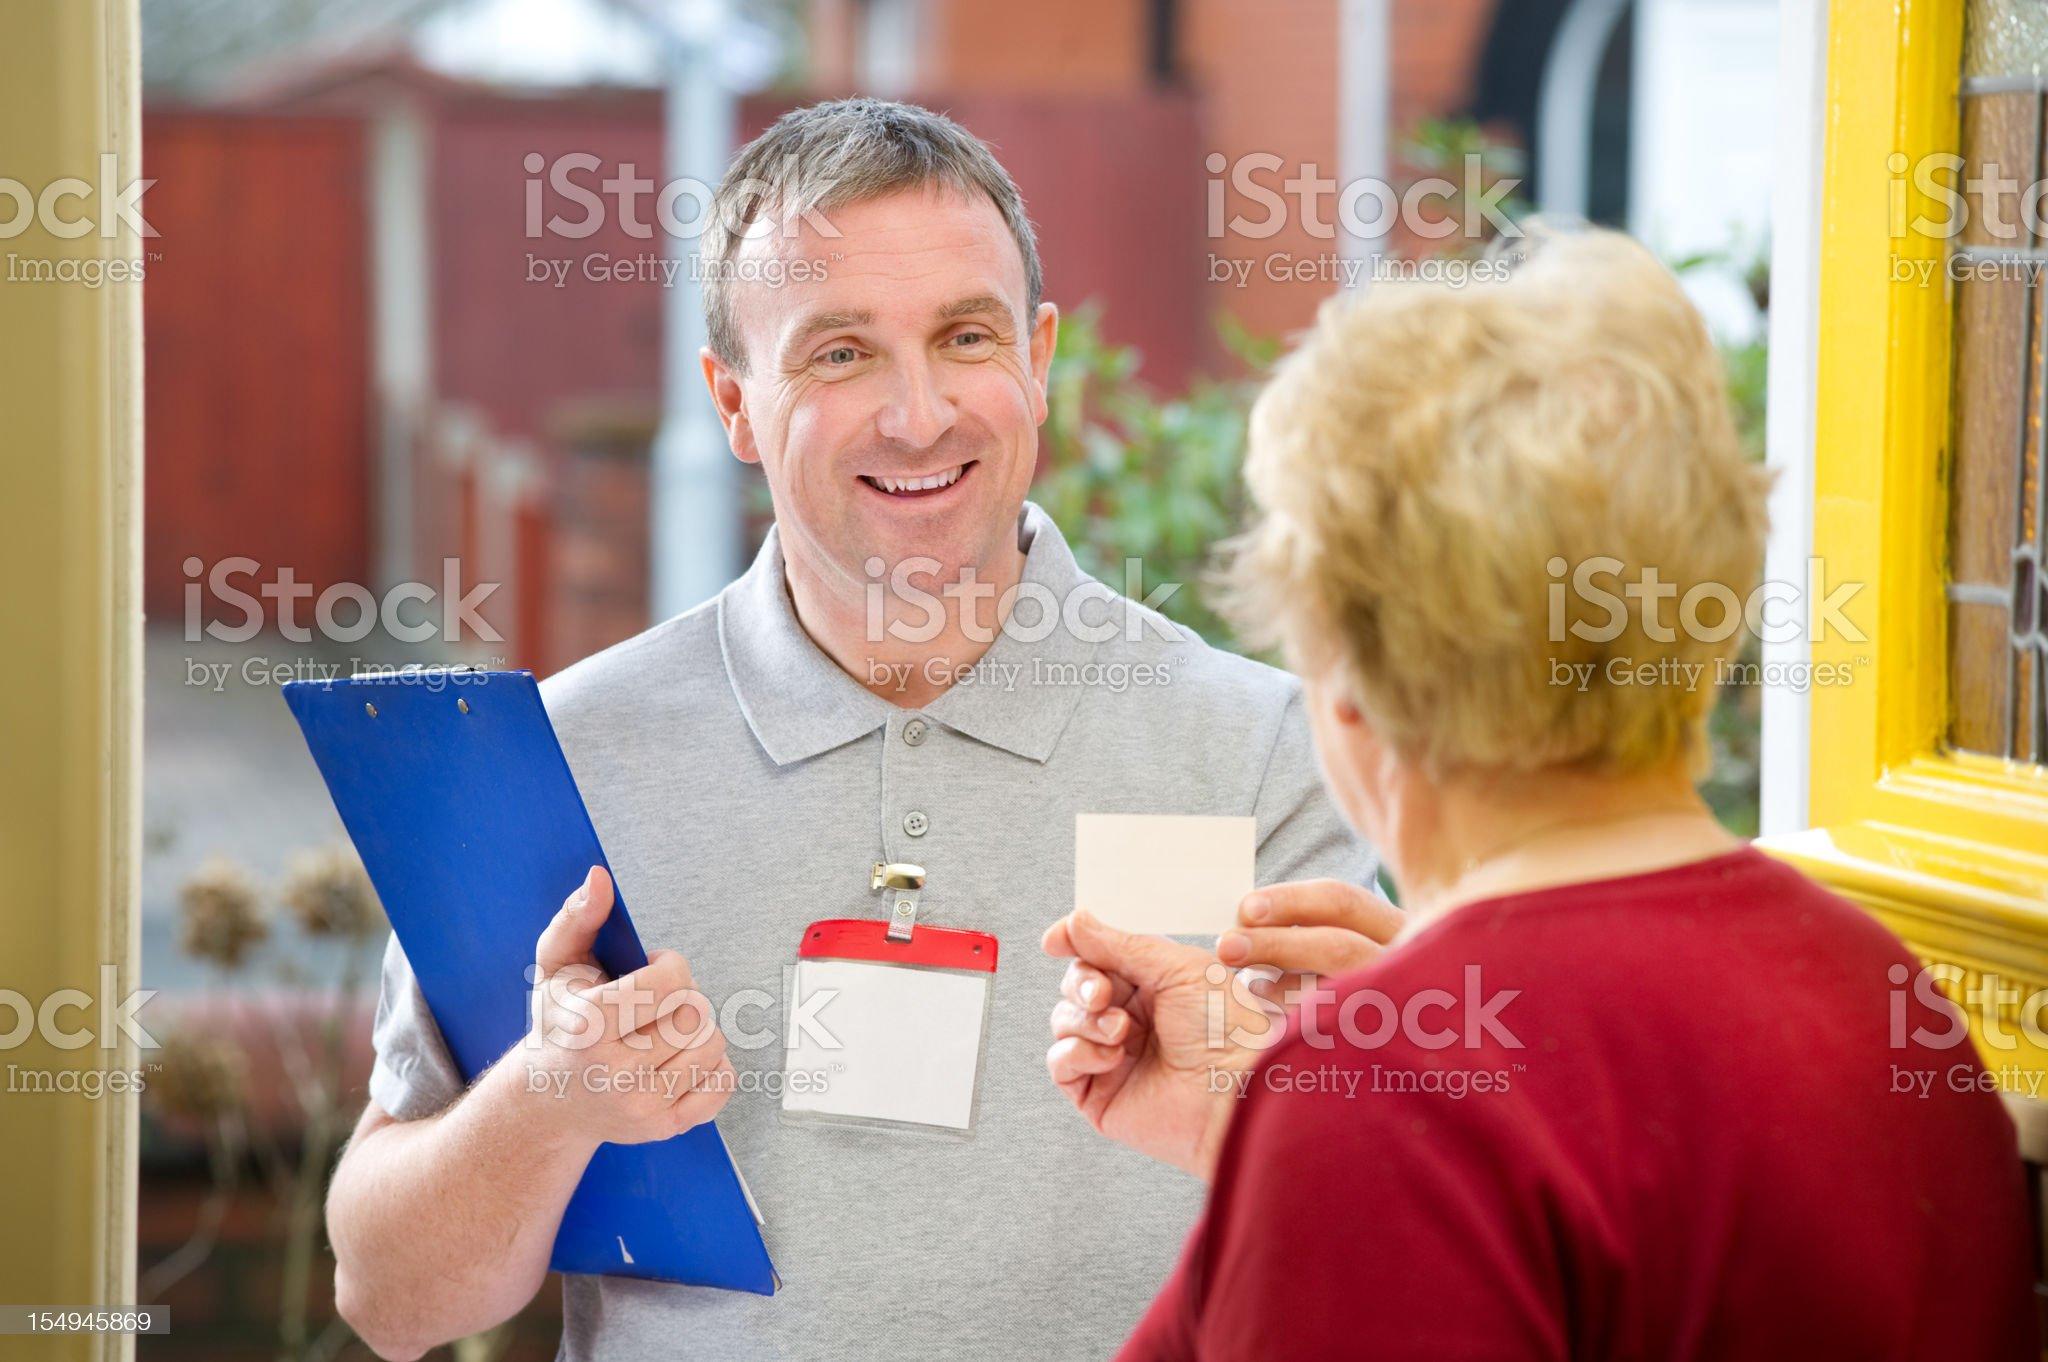 Smiling salesman royalty-free stock photo